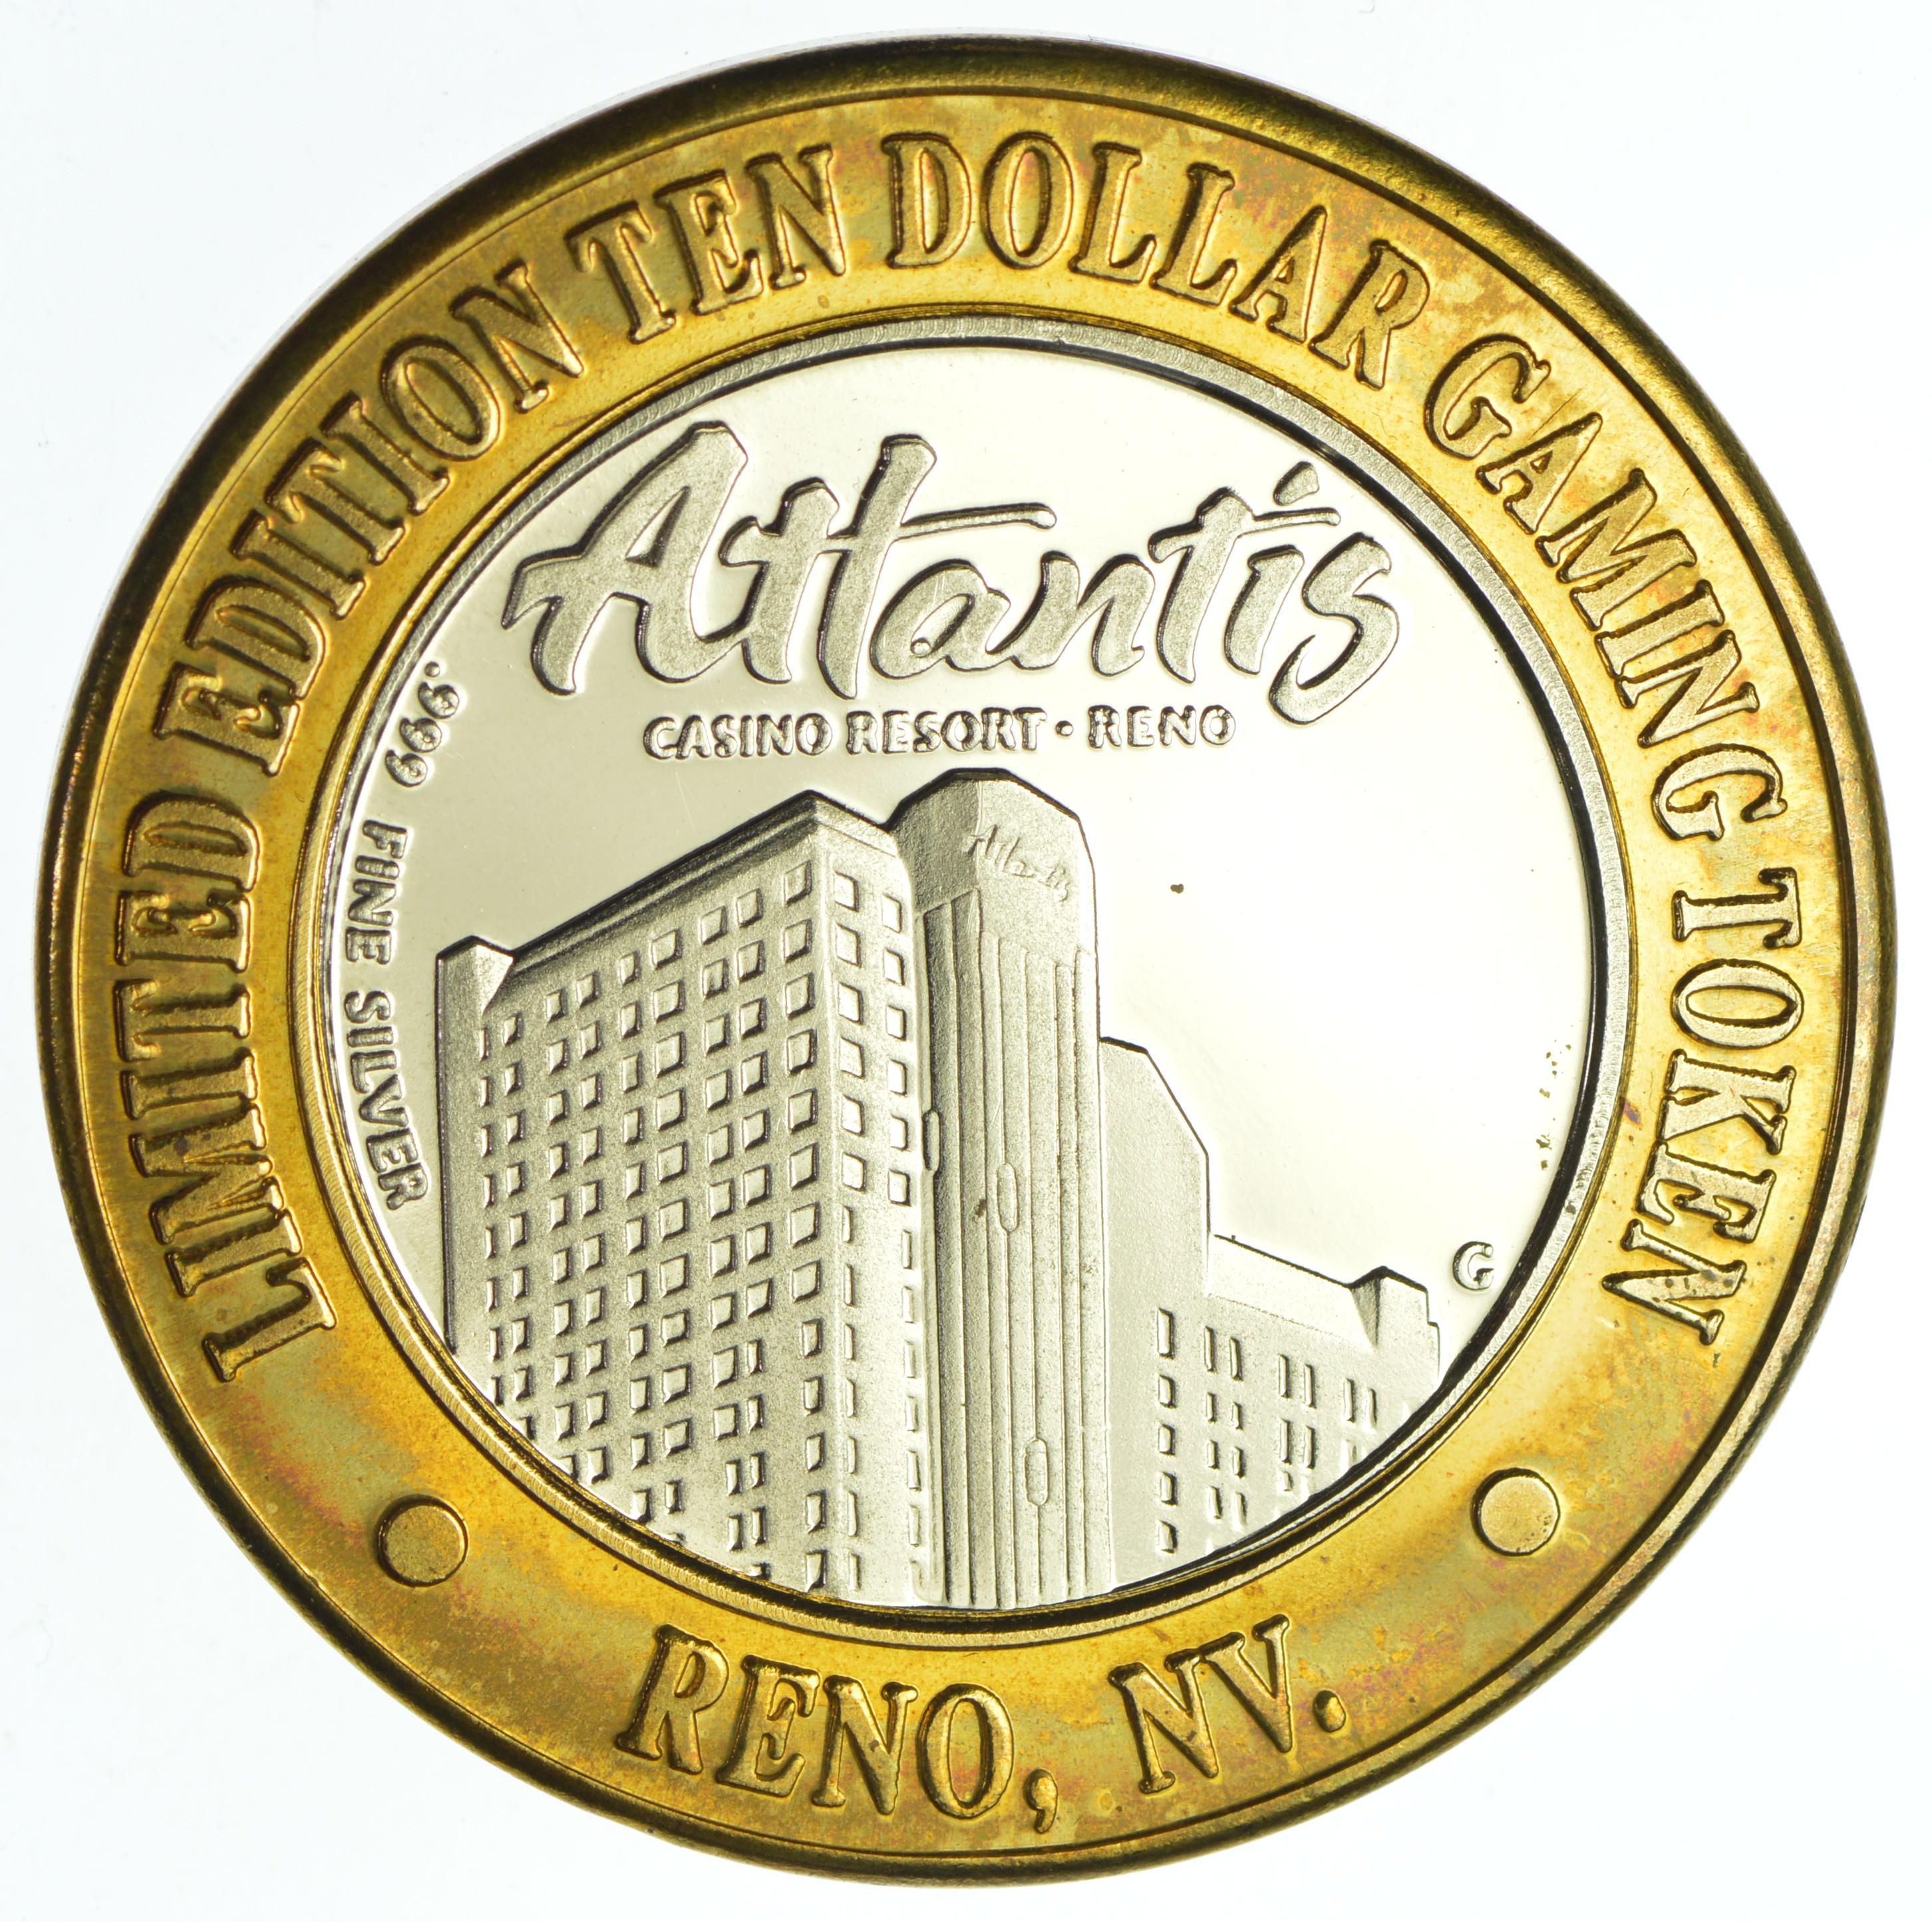 999 Fine Silver Center Atlantis Casino Resort Reno Nv Chip 10 Token Rare Approx 0 60